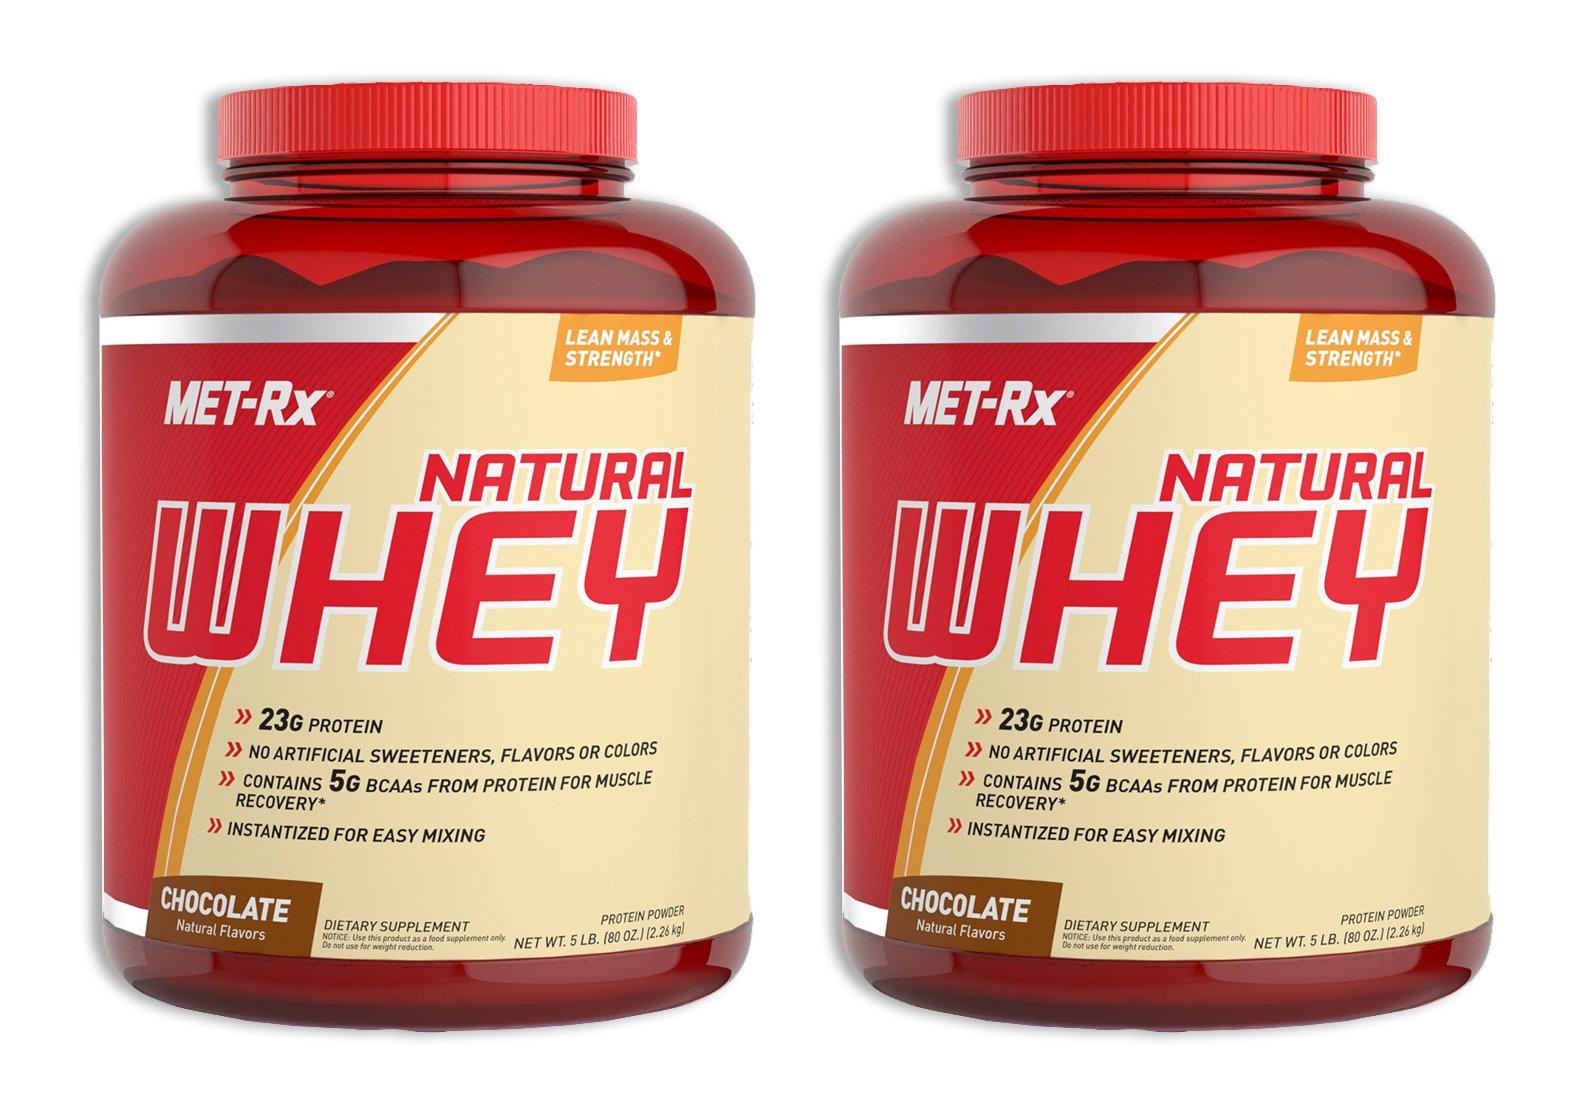 MET-Rx Natural Whey Chocolate 5 LB (2 Pack) by MET-Rx (Image #1)